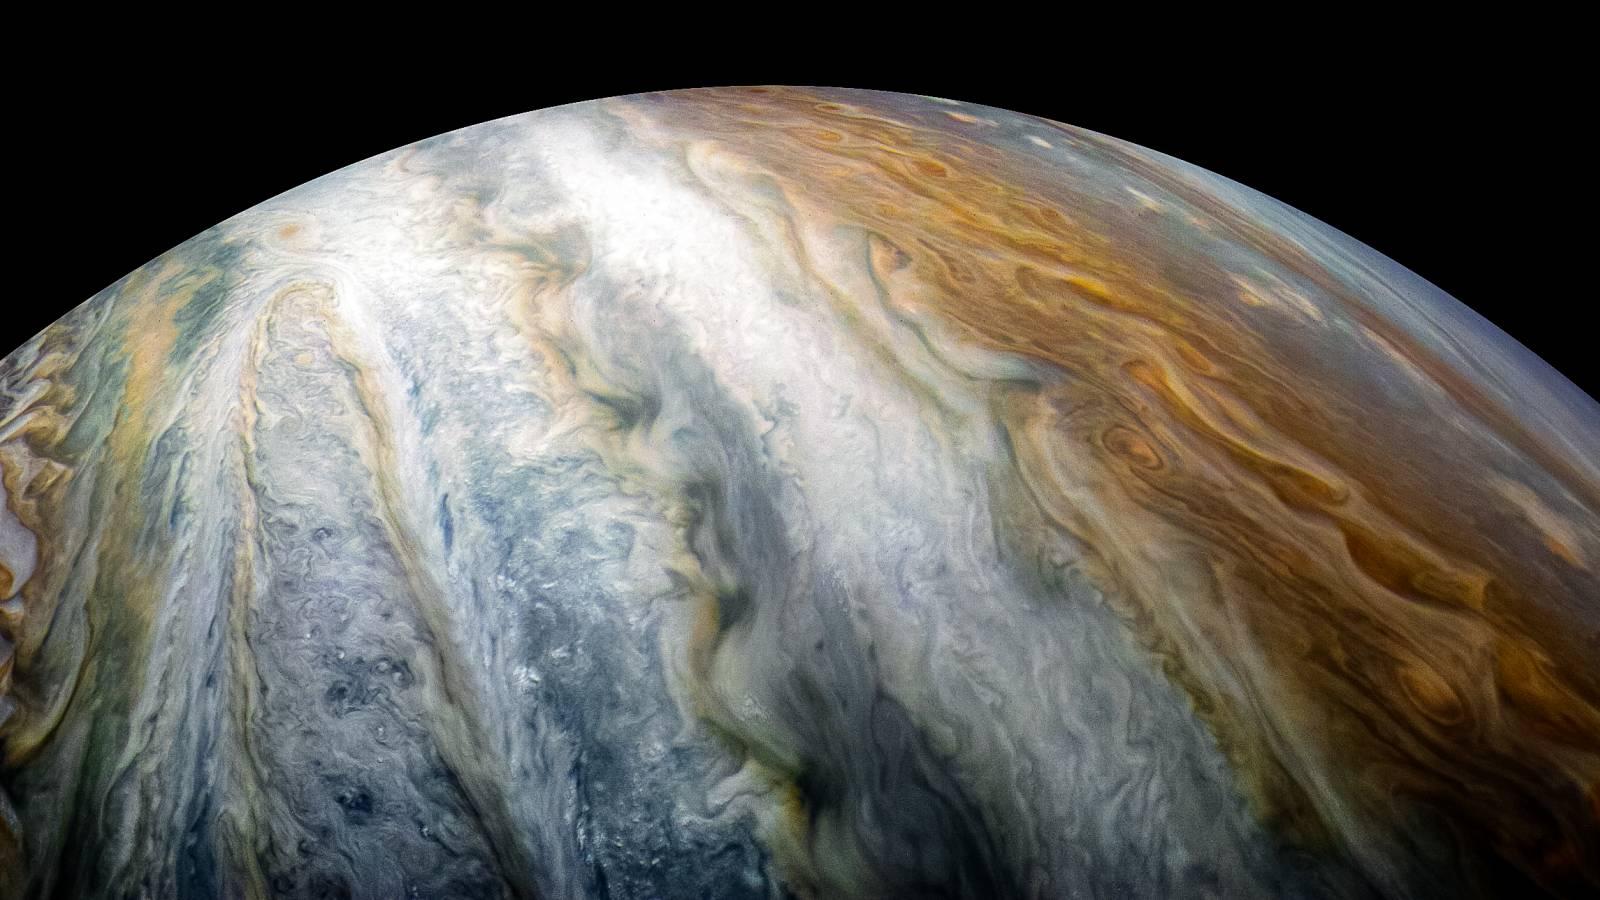 Planeta Jupiter. FOTO INCREDIBILA care a PROVOCAT Internetul